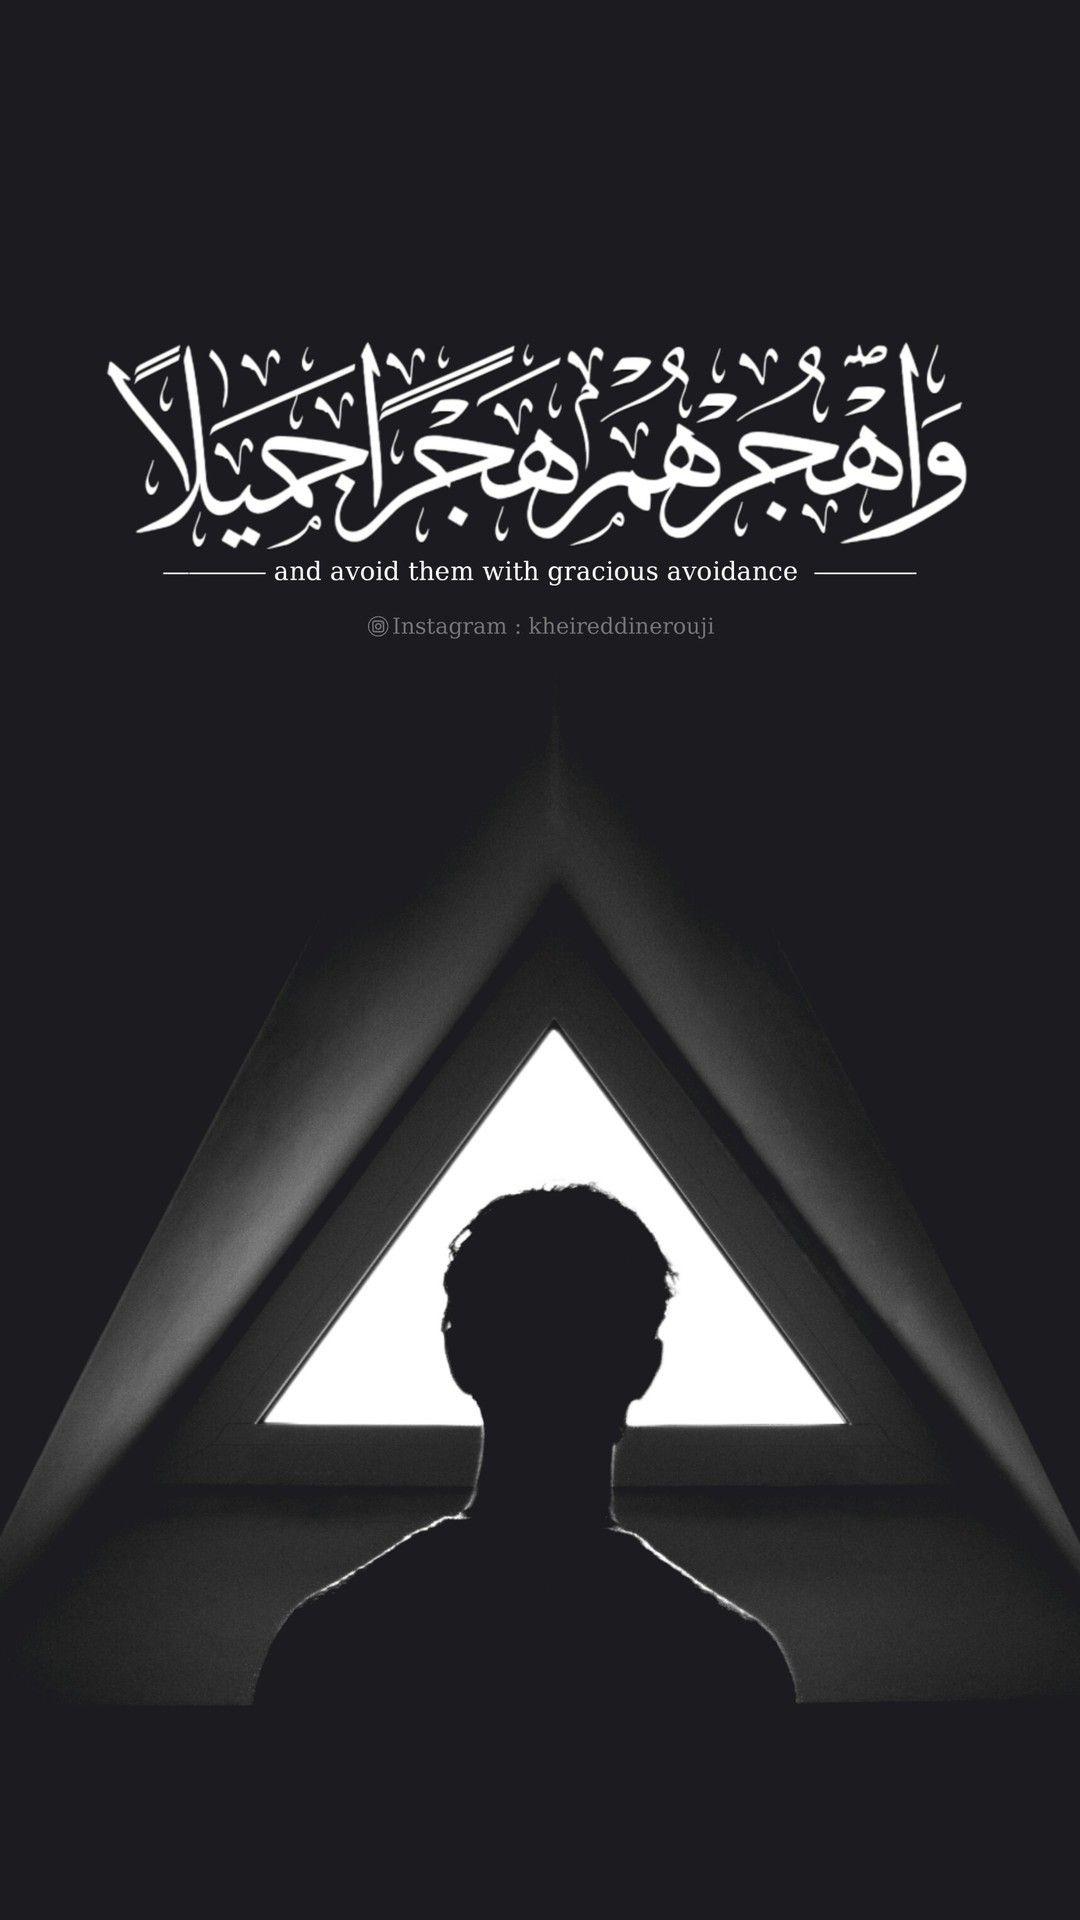 Kheireddine ر ب ن ا ء ات ن ا م ن ل د نك ر ح م ة و ه ی ئ Quran Book Islamic Art Calligraphy Islamic Caligraphy Art